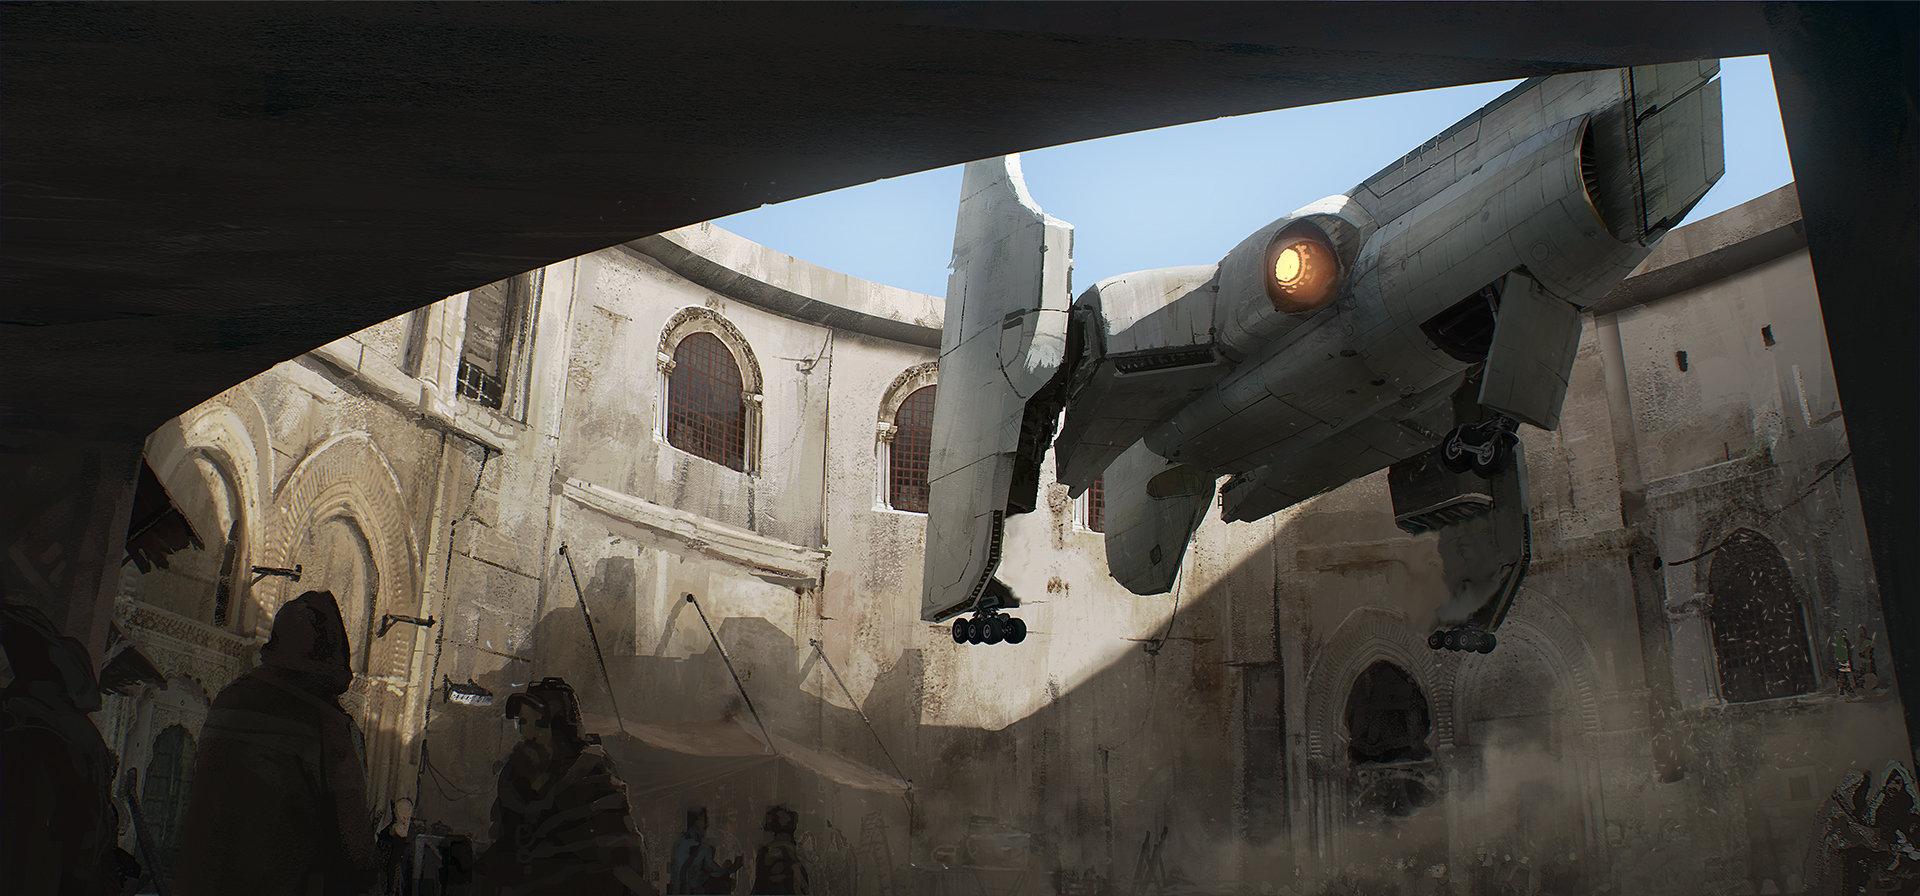 Julien gauthier illustration 24